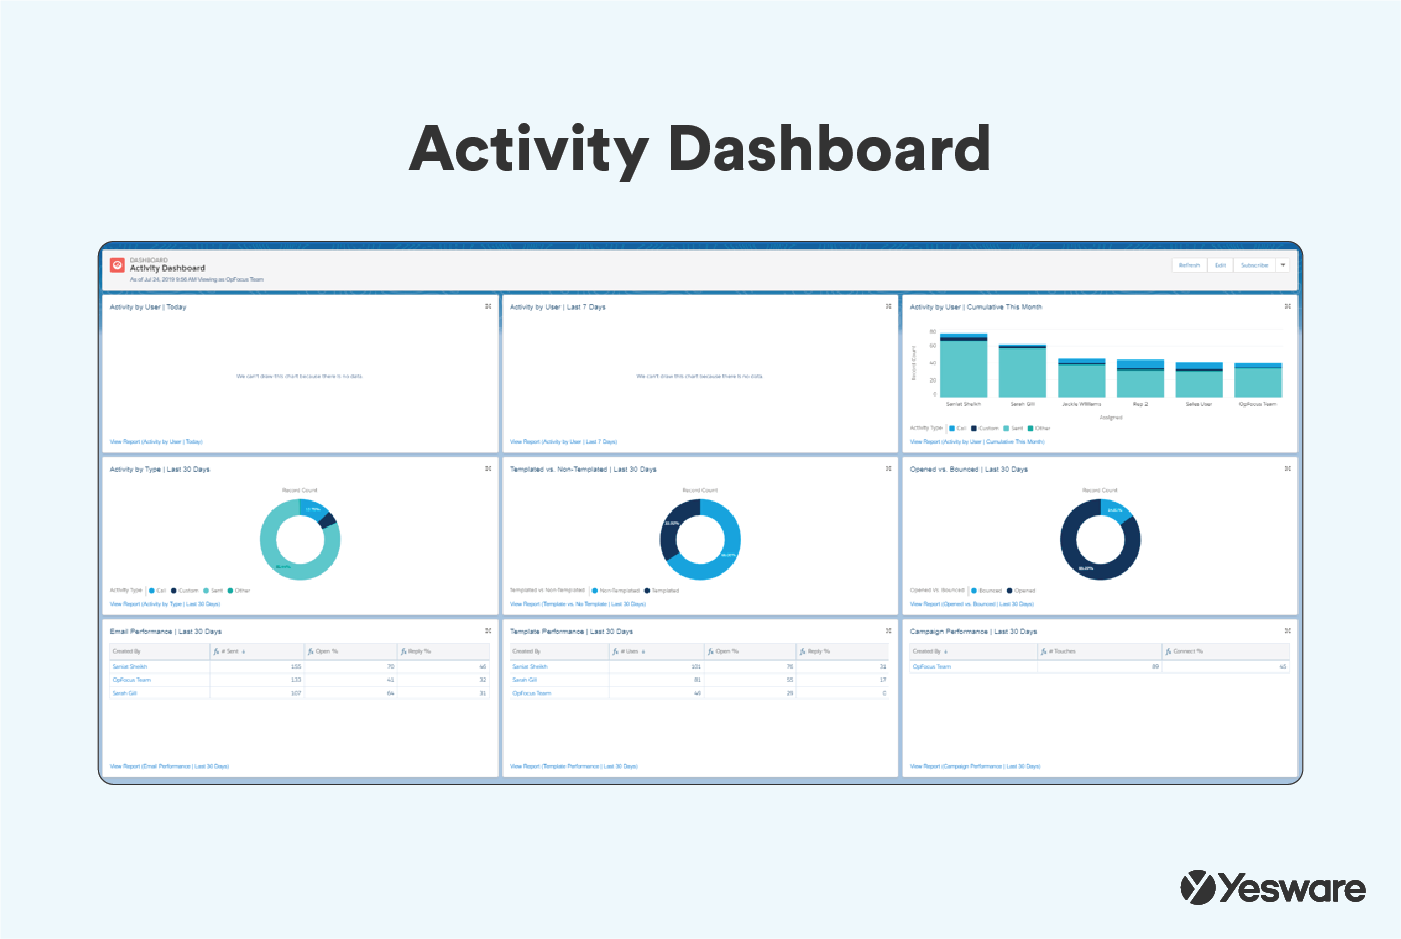 Activity Dashboard in Yesware